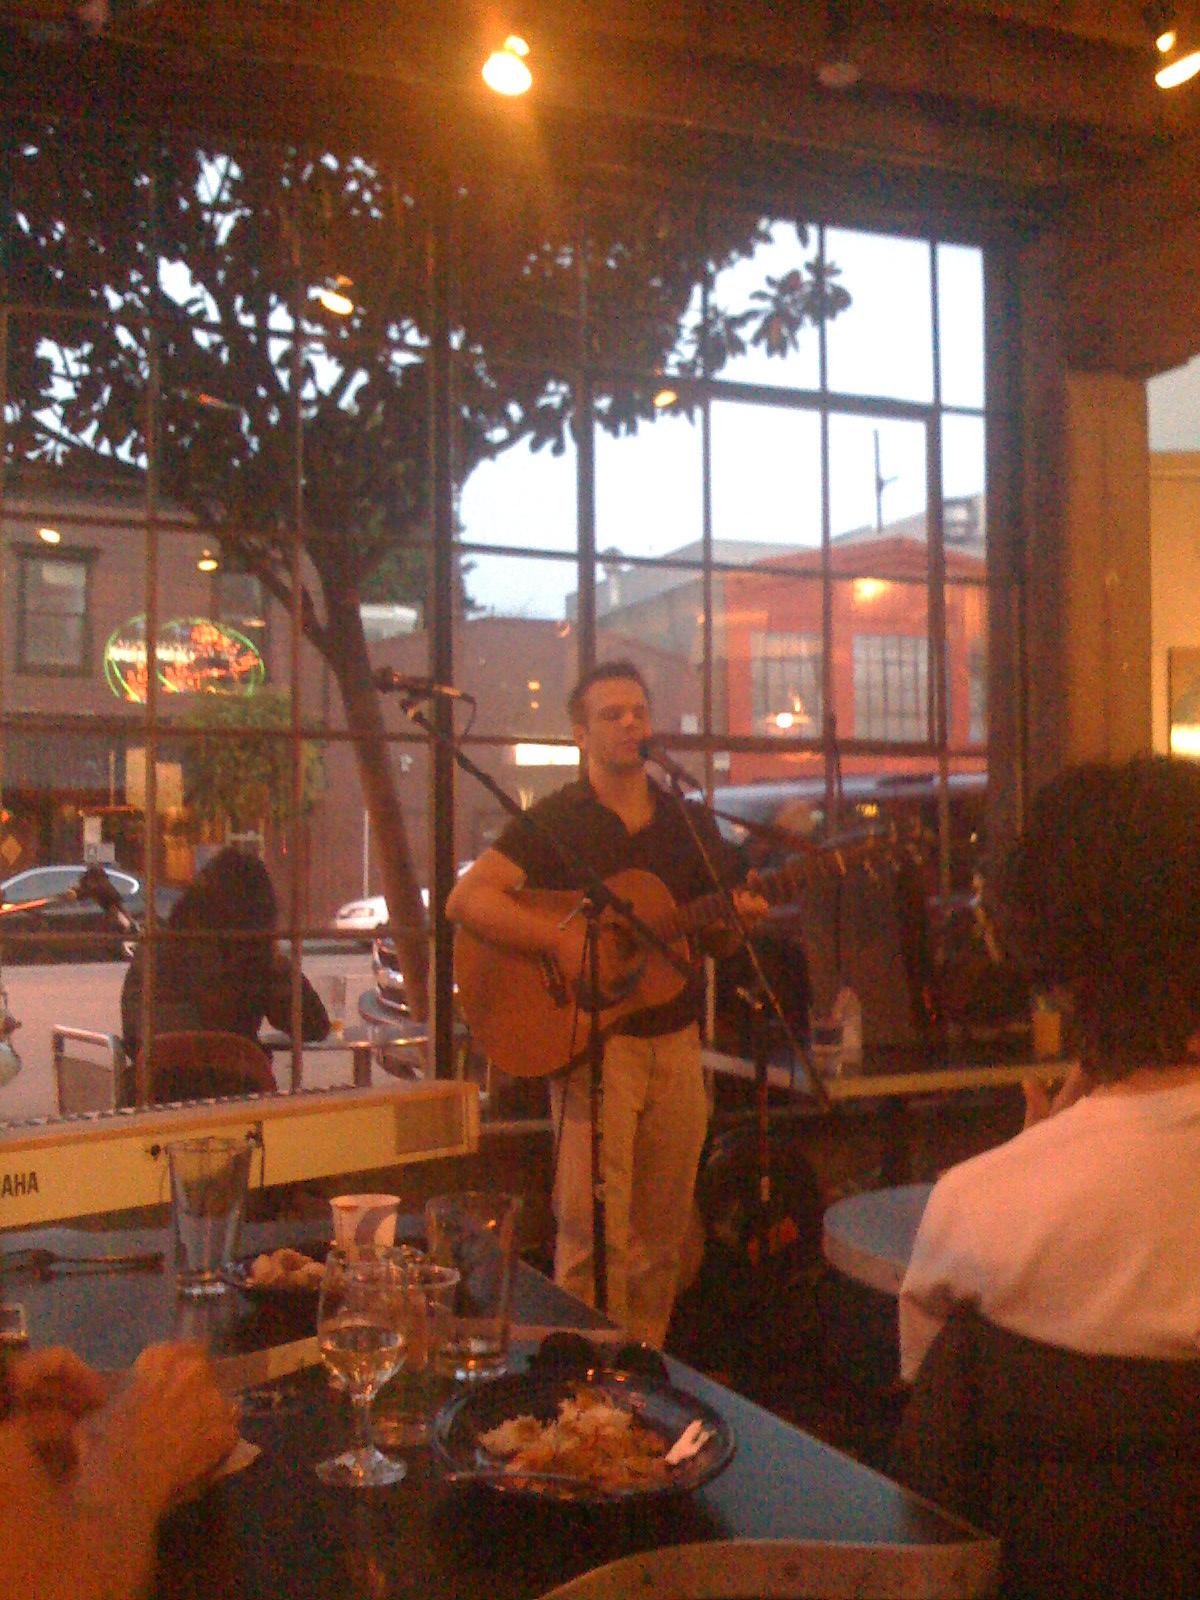 Tom Goss Performance at Brainwash San Francisco Photo by Tasithoughts